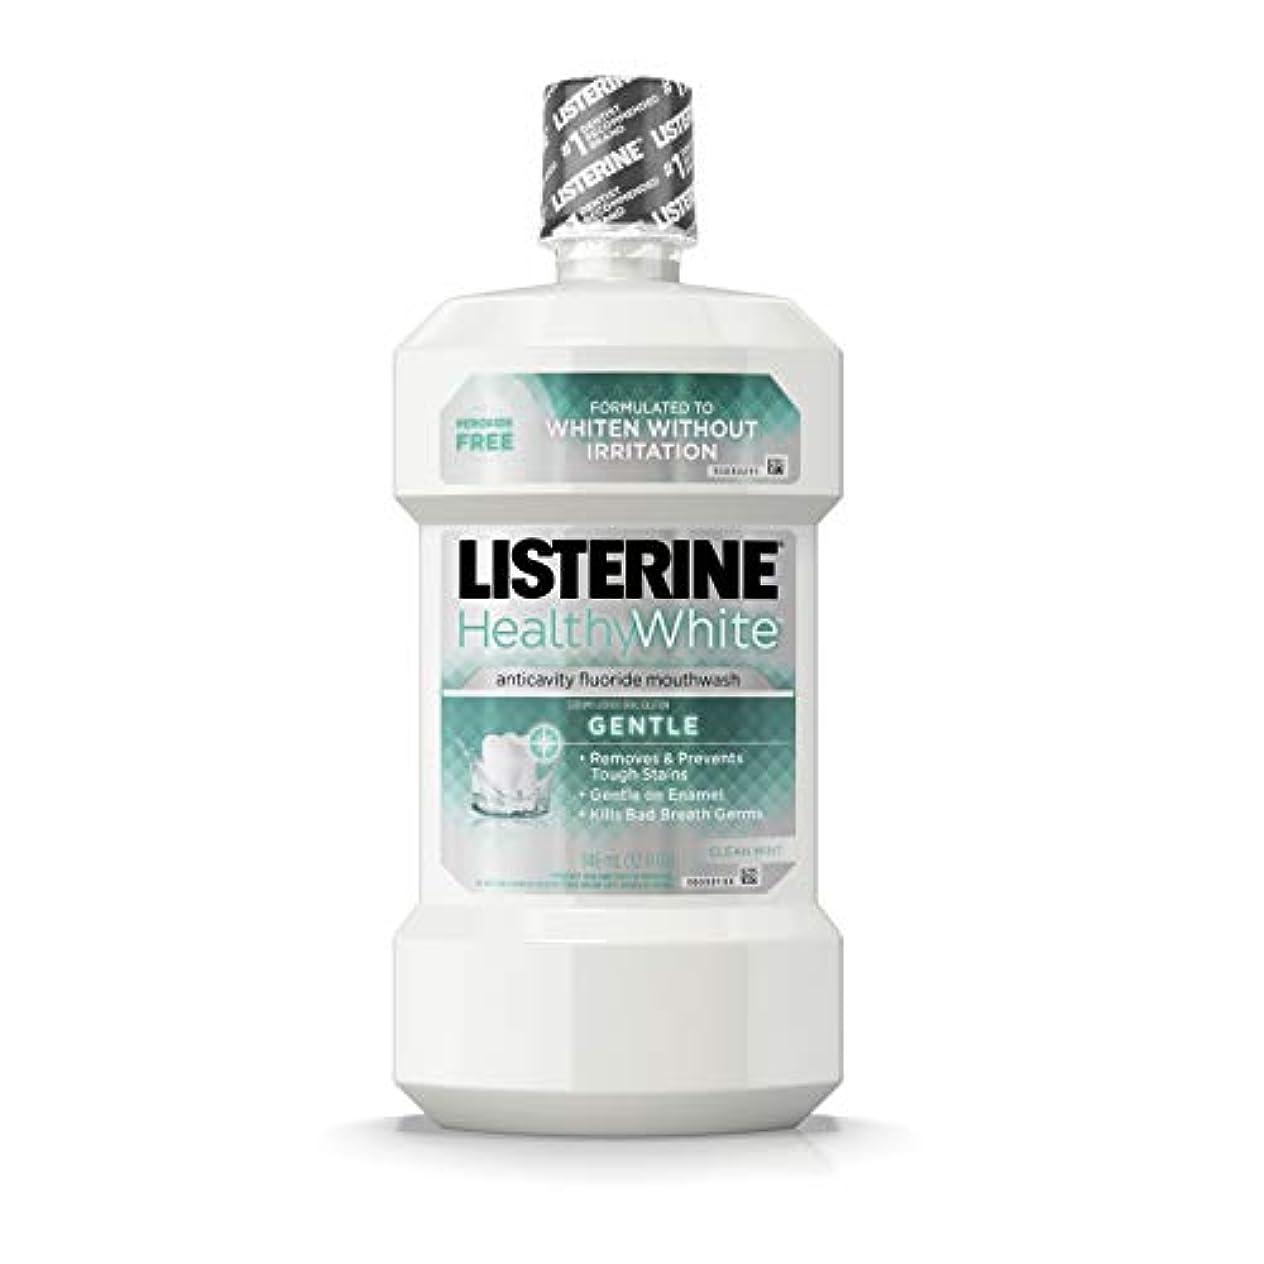 Listerine ジェントルクリーンマウスウォッシュ - クリーンミント 1パック